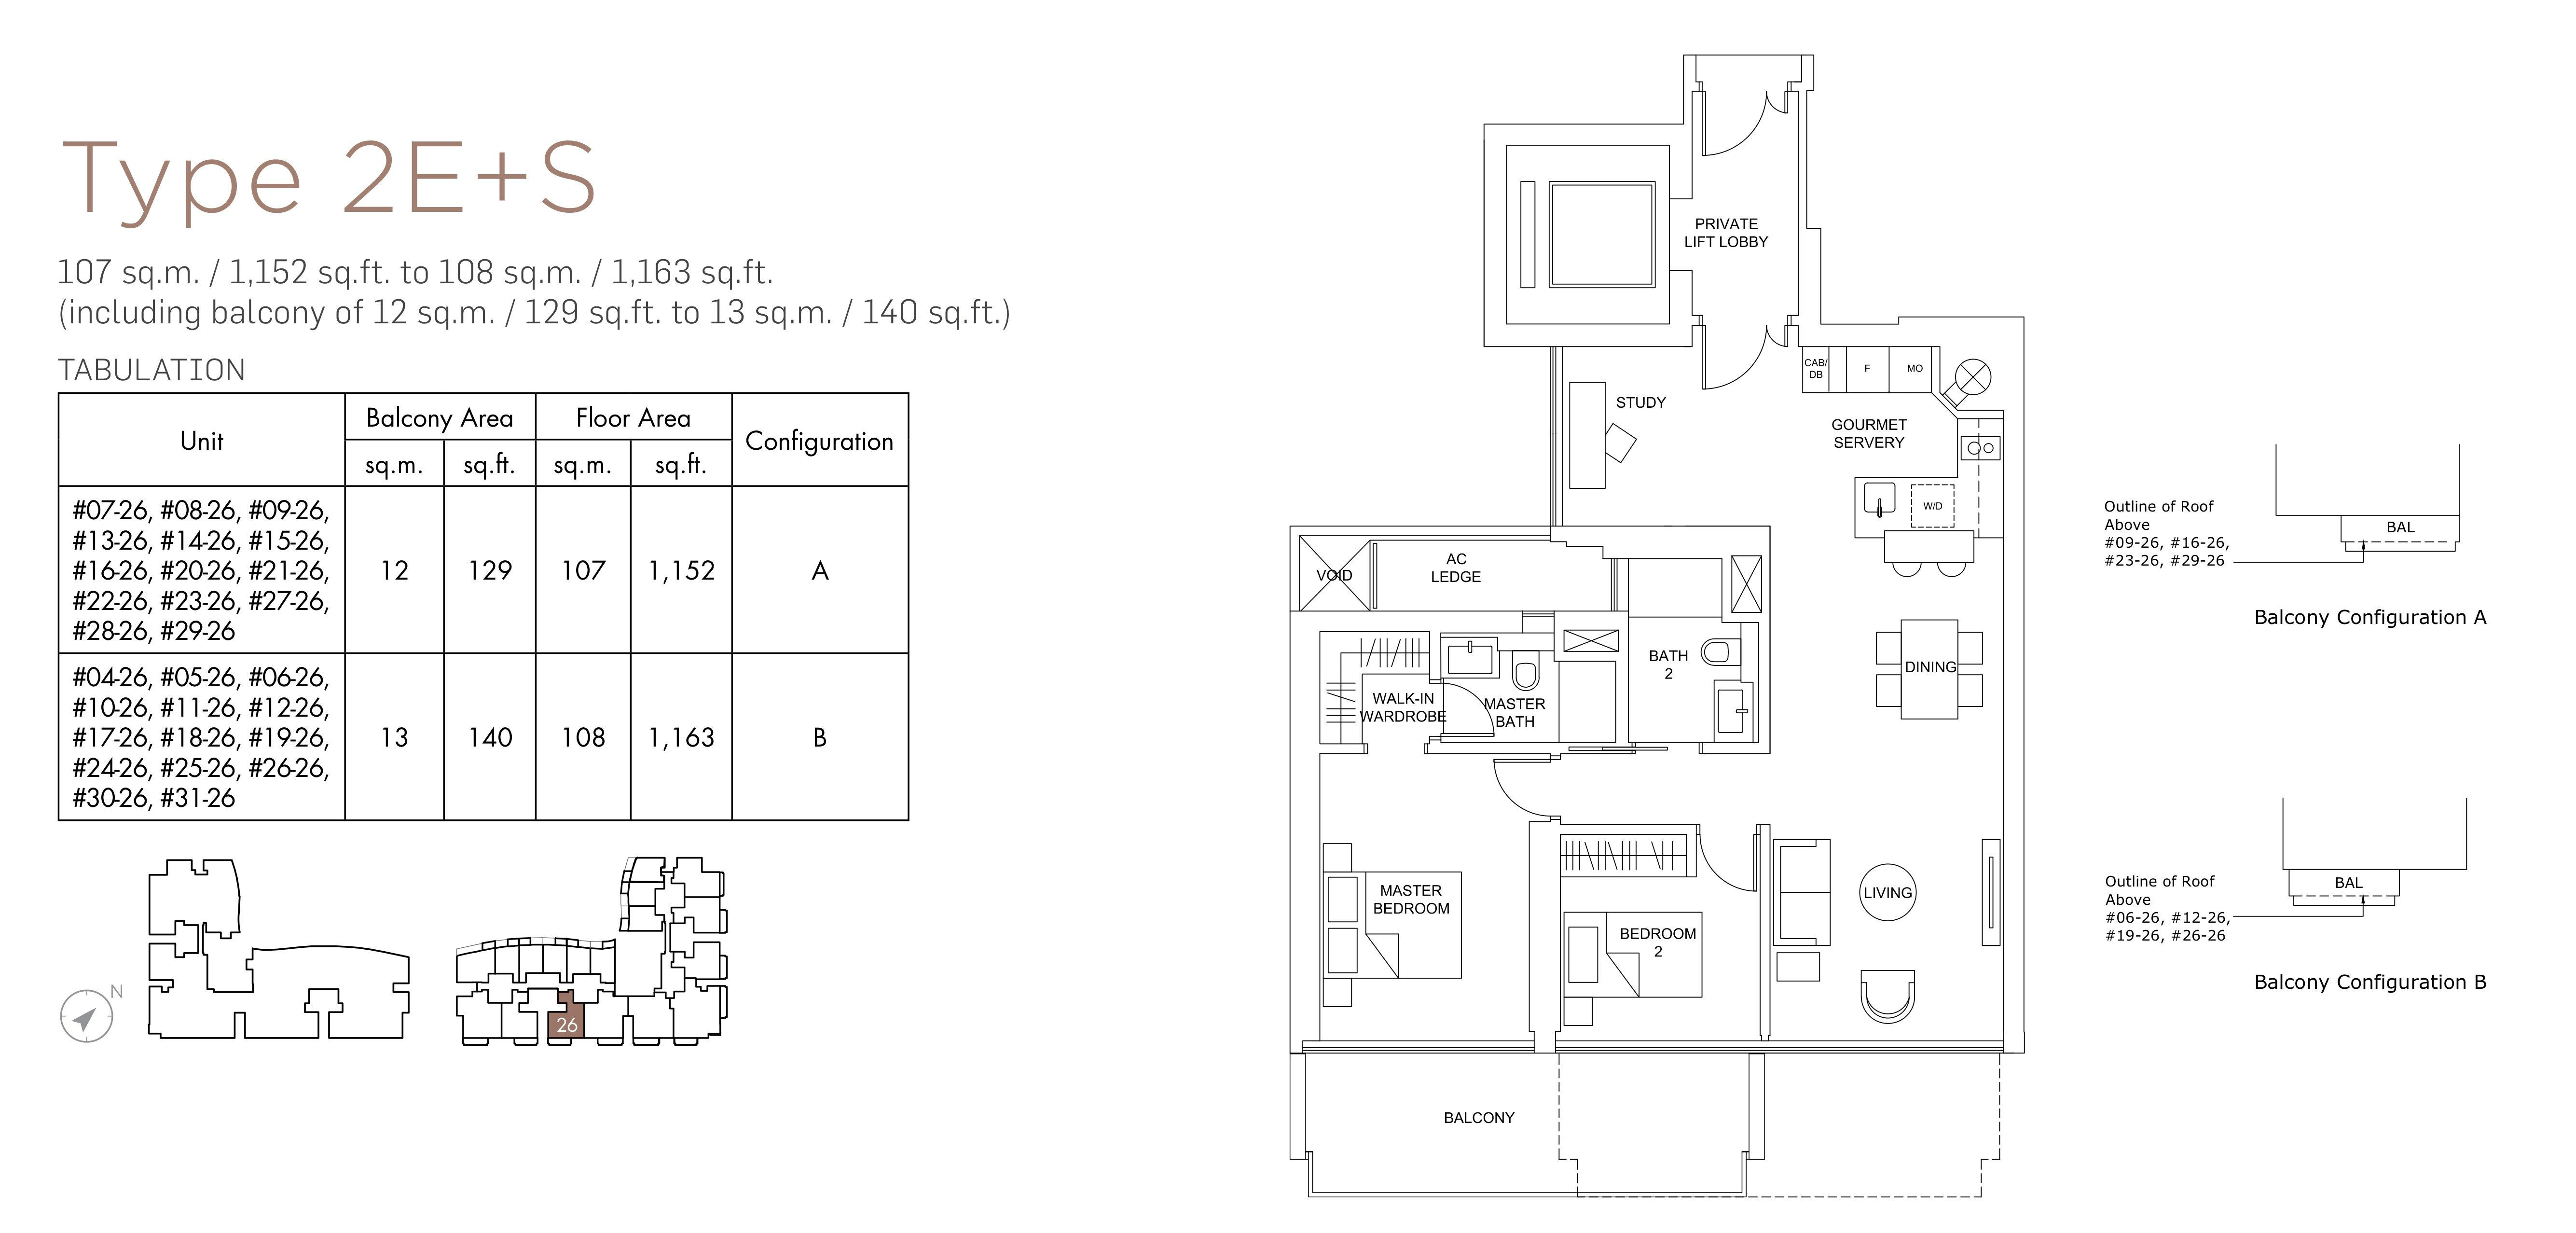 Marina One Residences 滨海盛景豪苑 floor plans 2 bedroom +study 2E+S